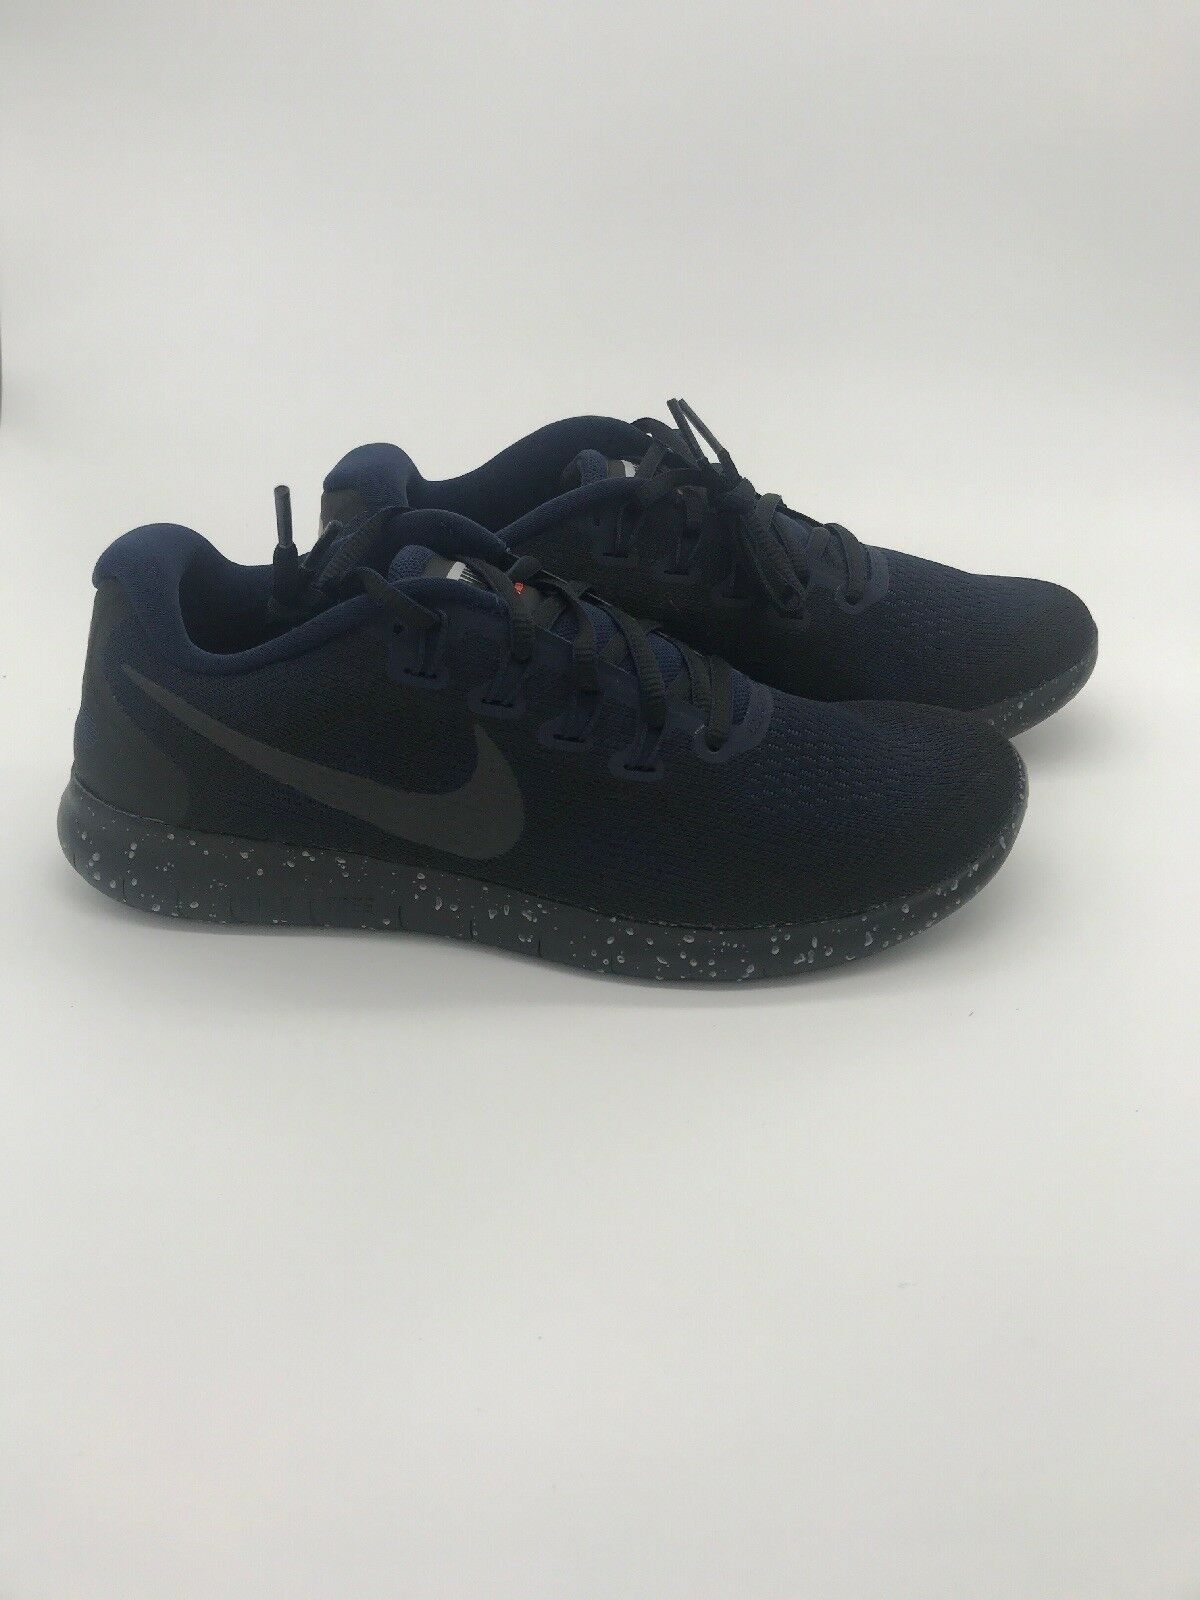 Nike Free RN RN RN 2017 Shield AA3760-001 Triple Black Obsidian Running Men's Size 8.5 1d0f74